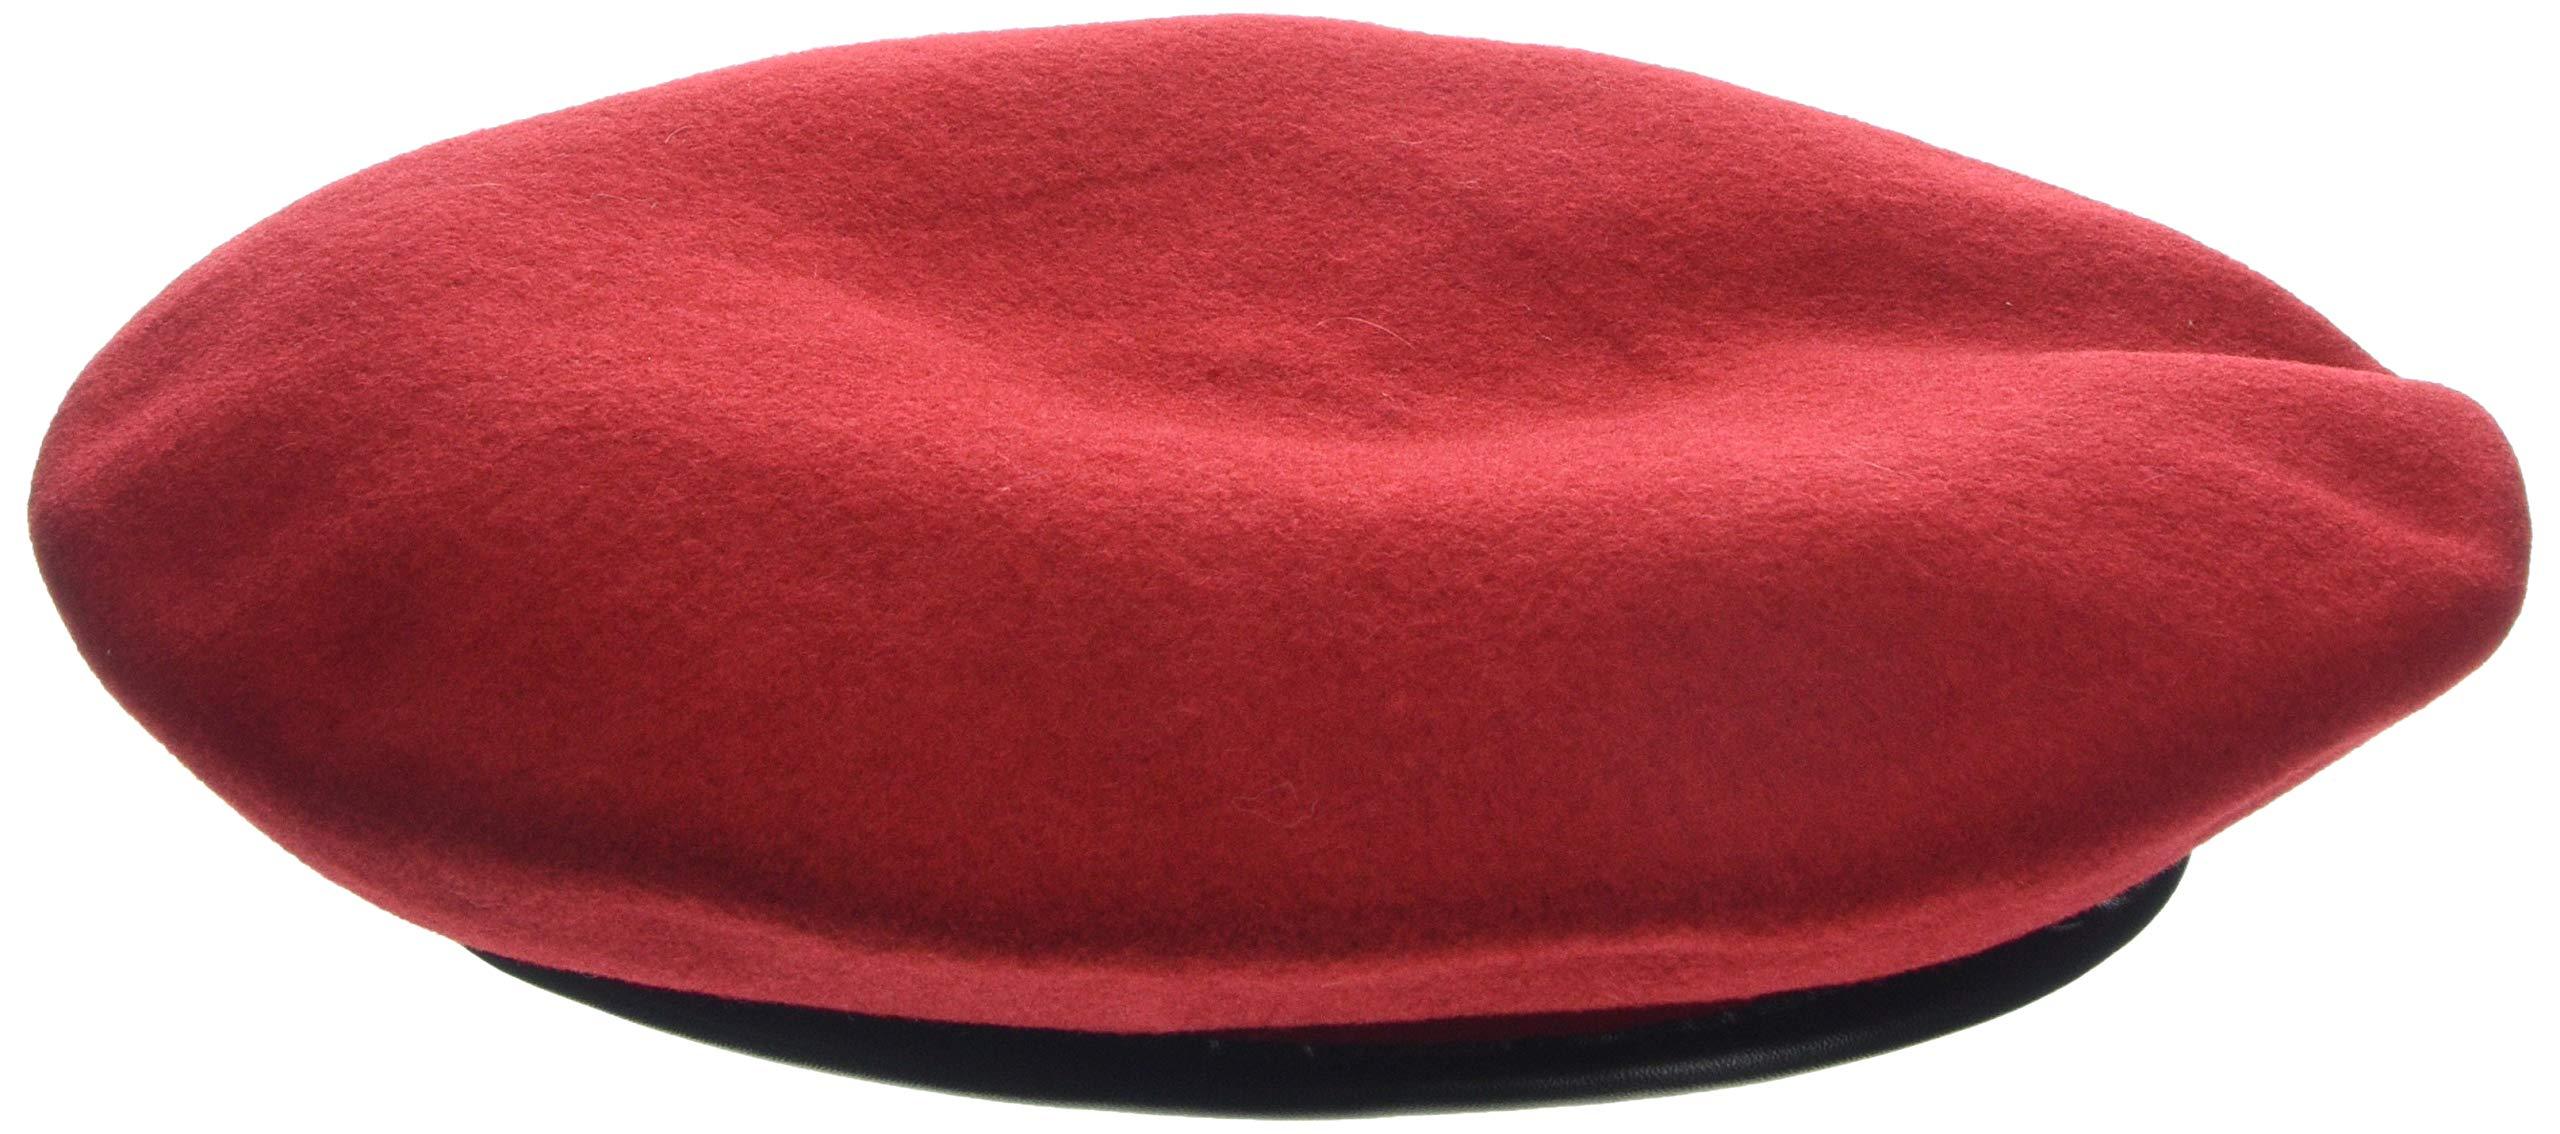 Kangol Classic Monty Beret, The Original Beret, Red (Small)